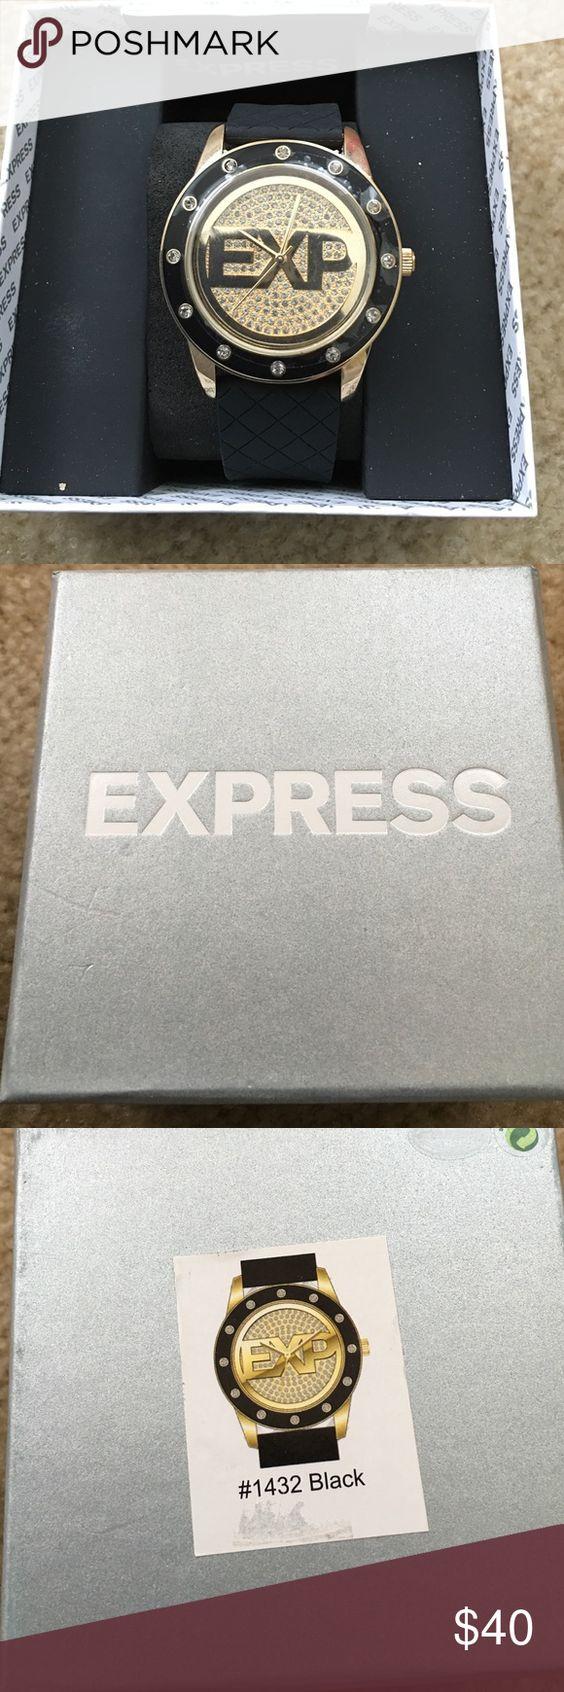 NWOT EXPRESS WOMEN'S WATCH;NEED BATTERY EXPRESS BIG FACE WATCH FOR A WOMAN Express Accessories Watches